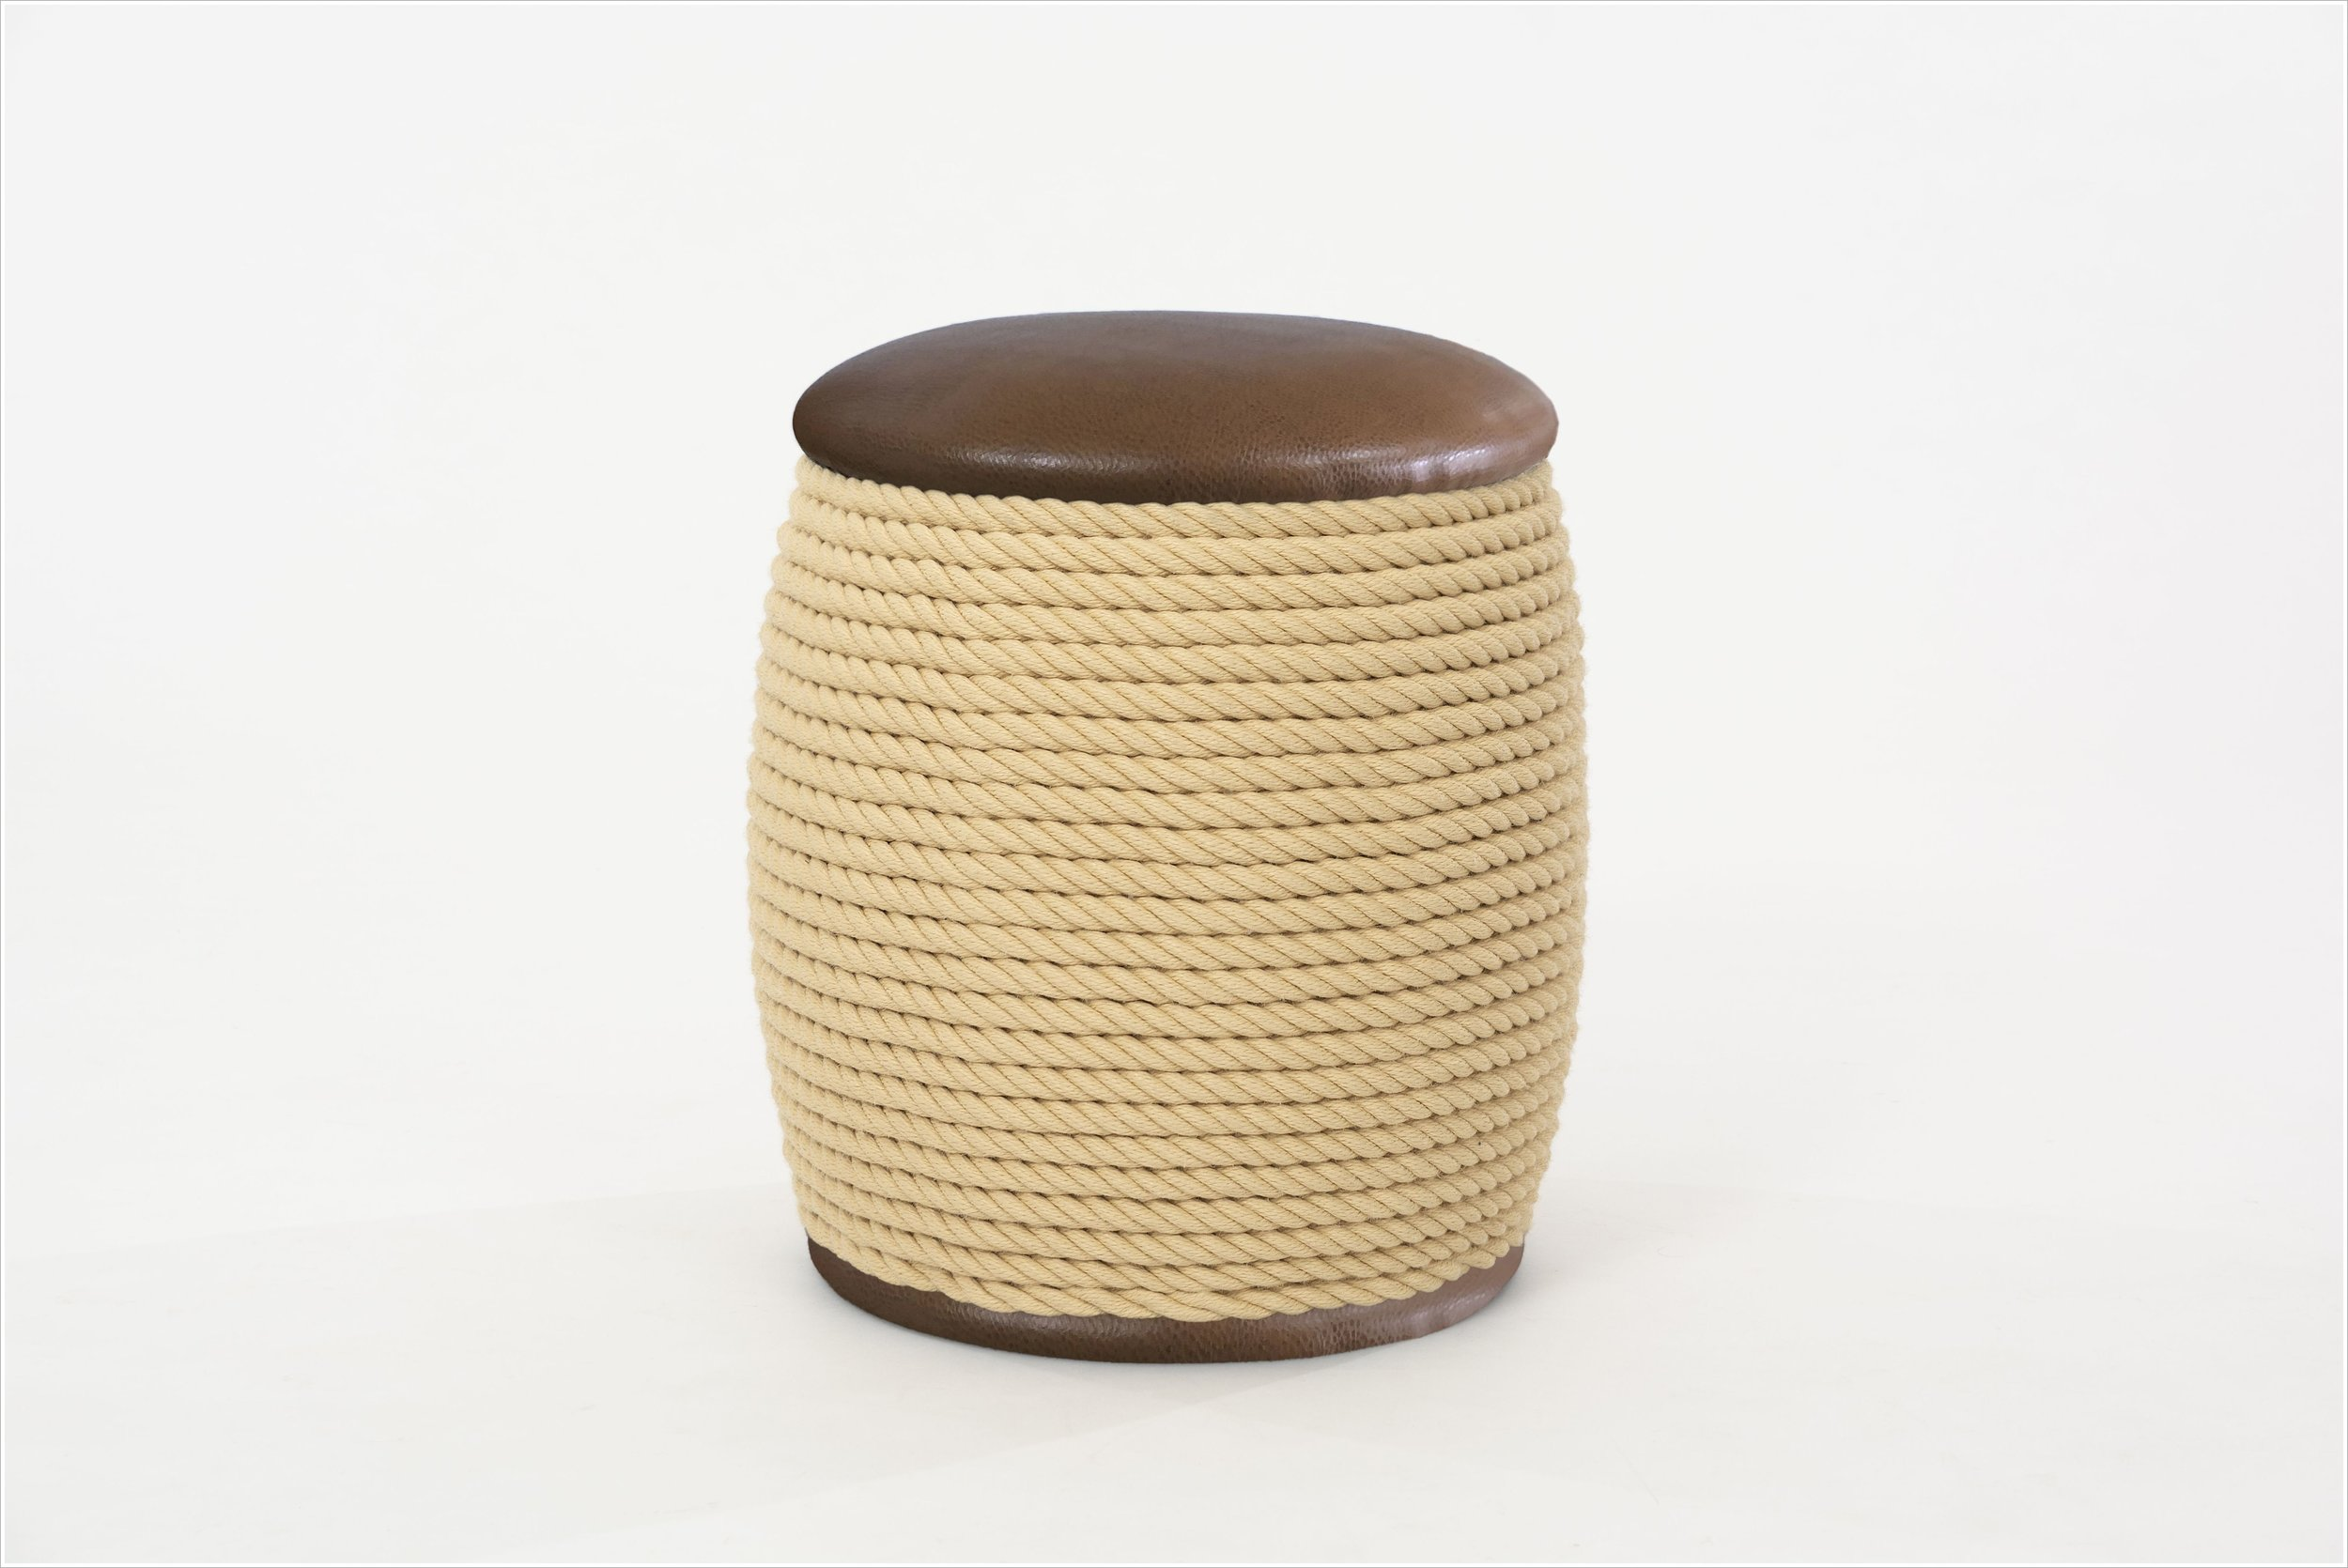 Custom Rope Stool